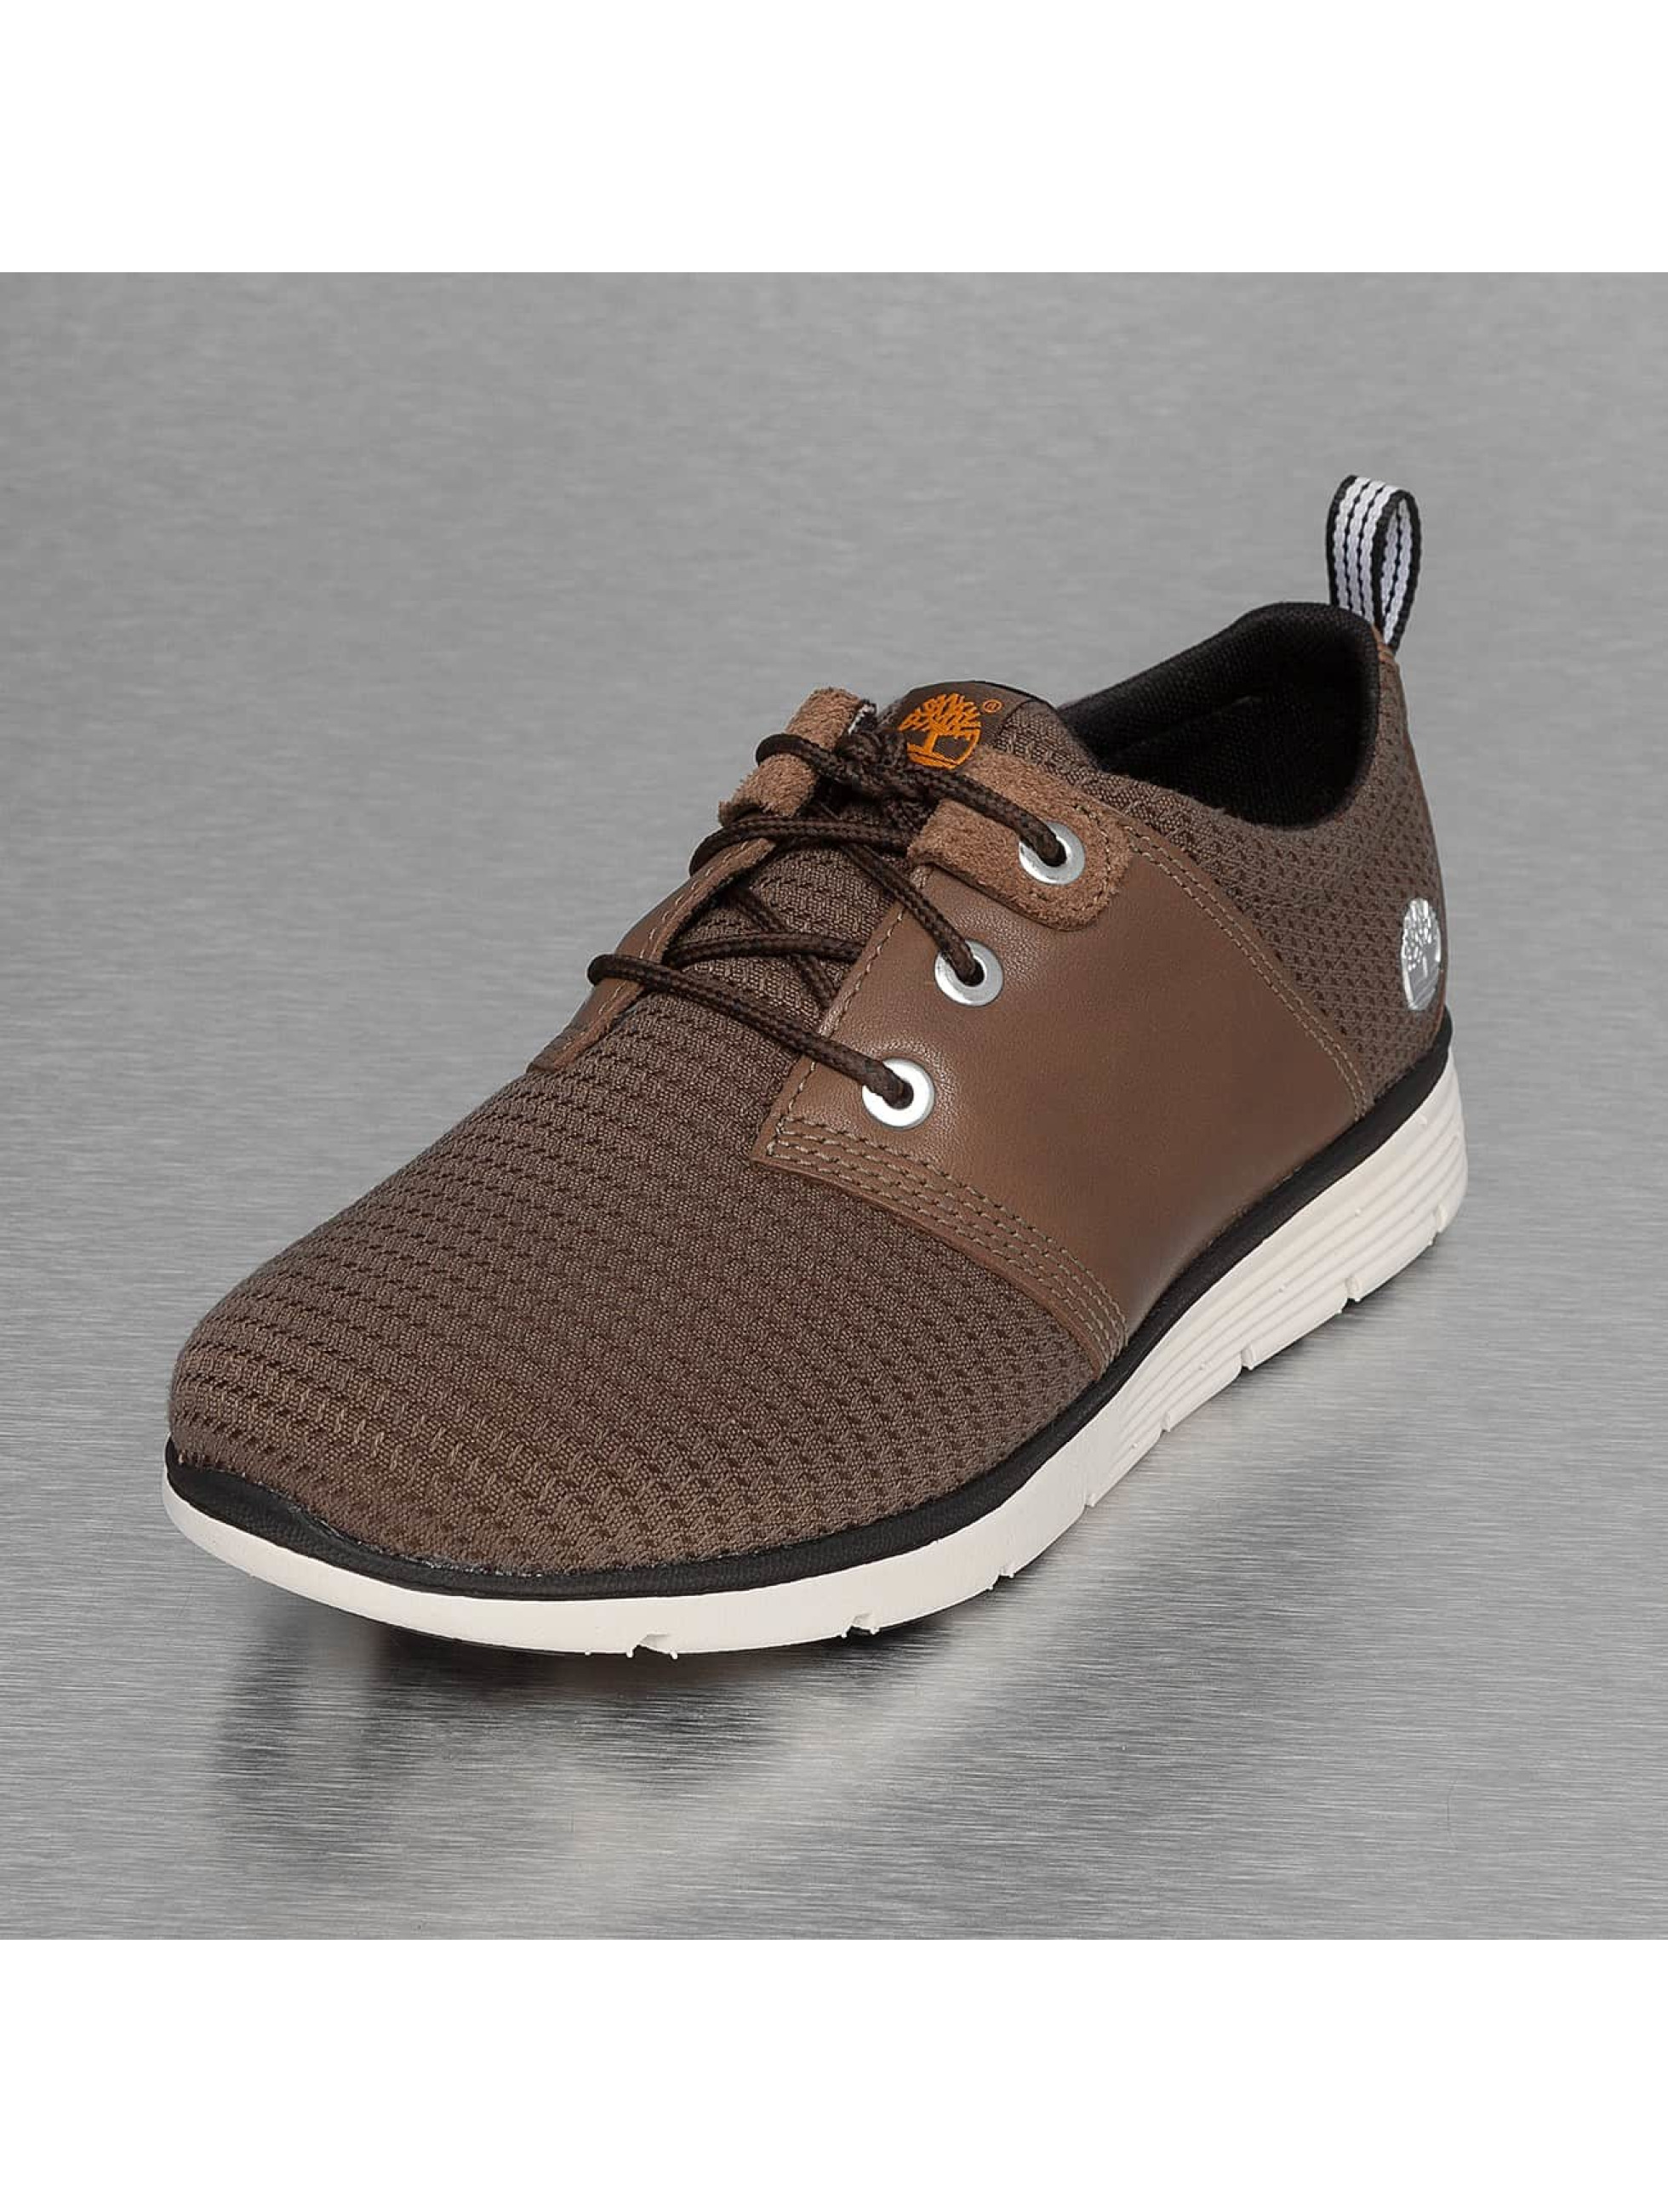 Timberland Sneakers Killington Oxford brown